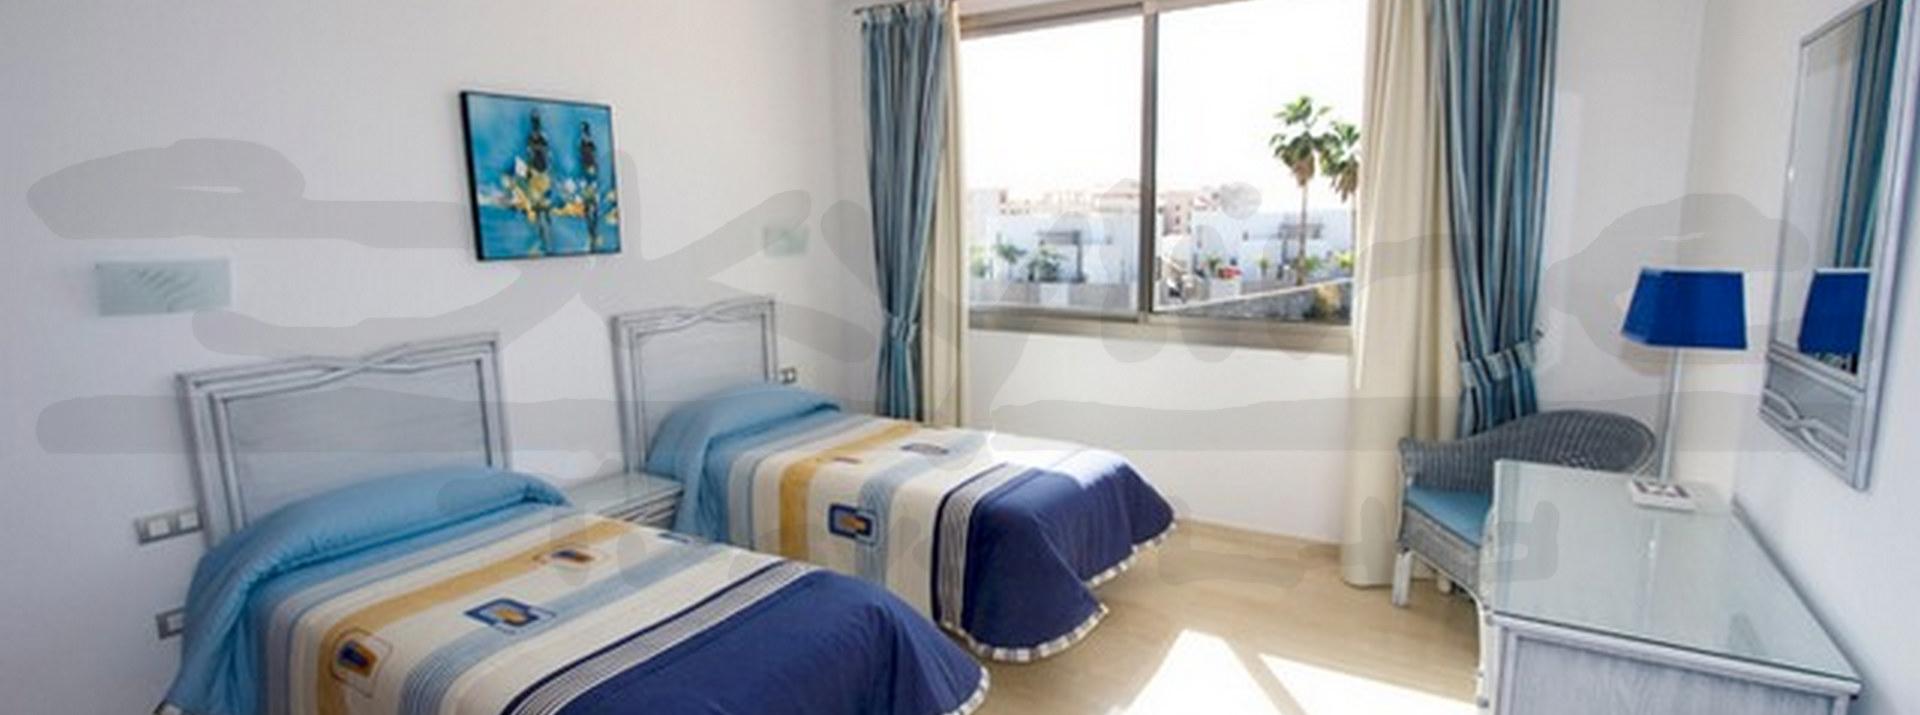 bedroom3.1.jpg